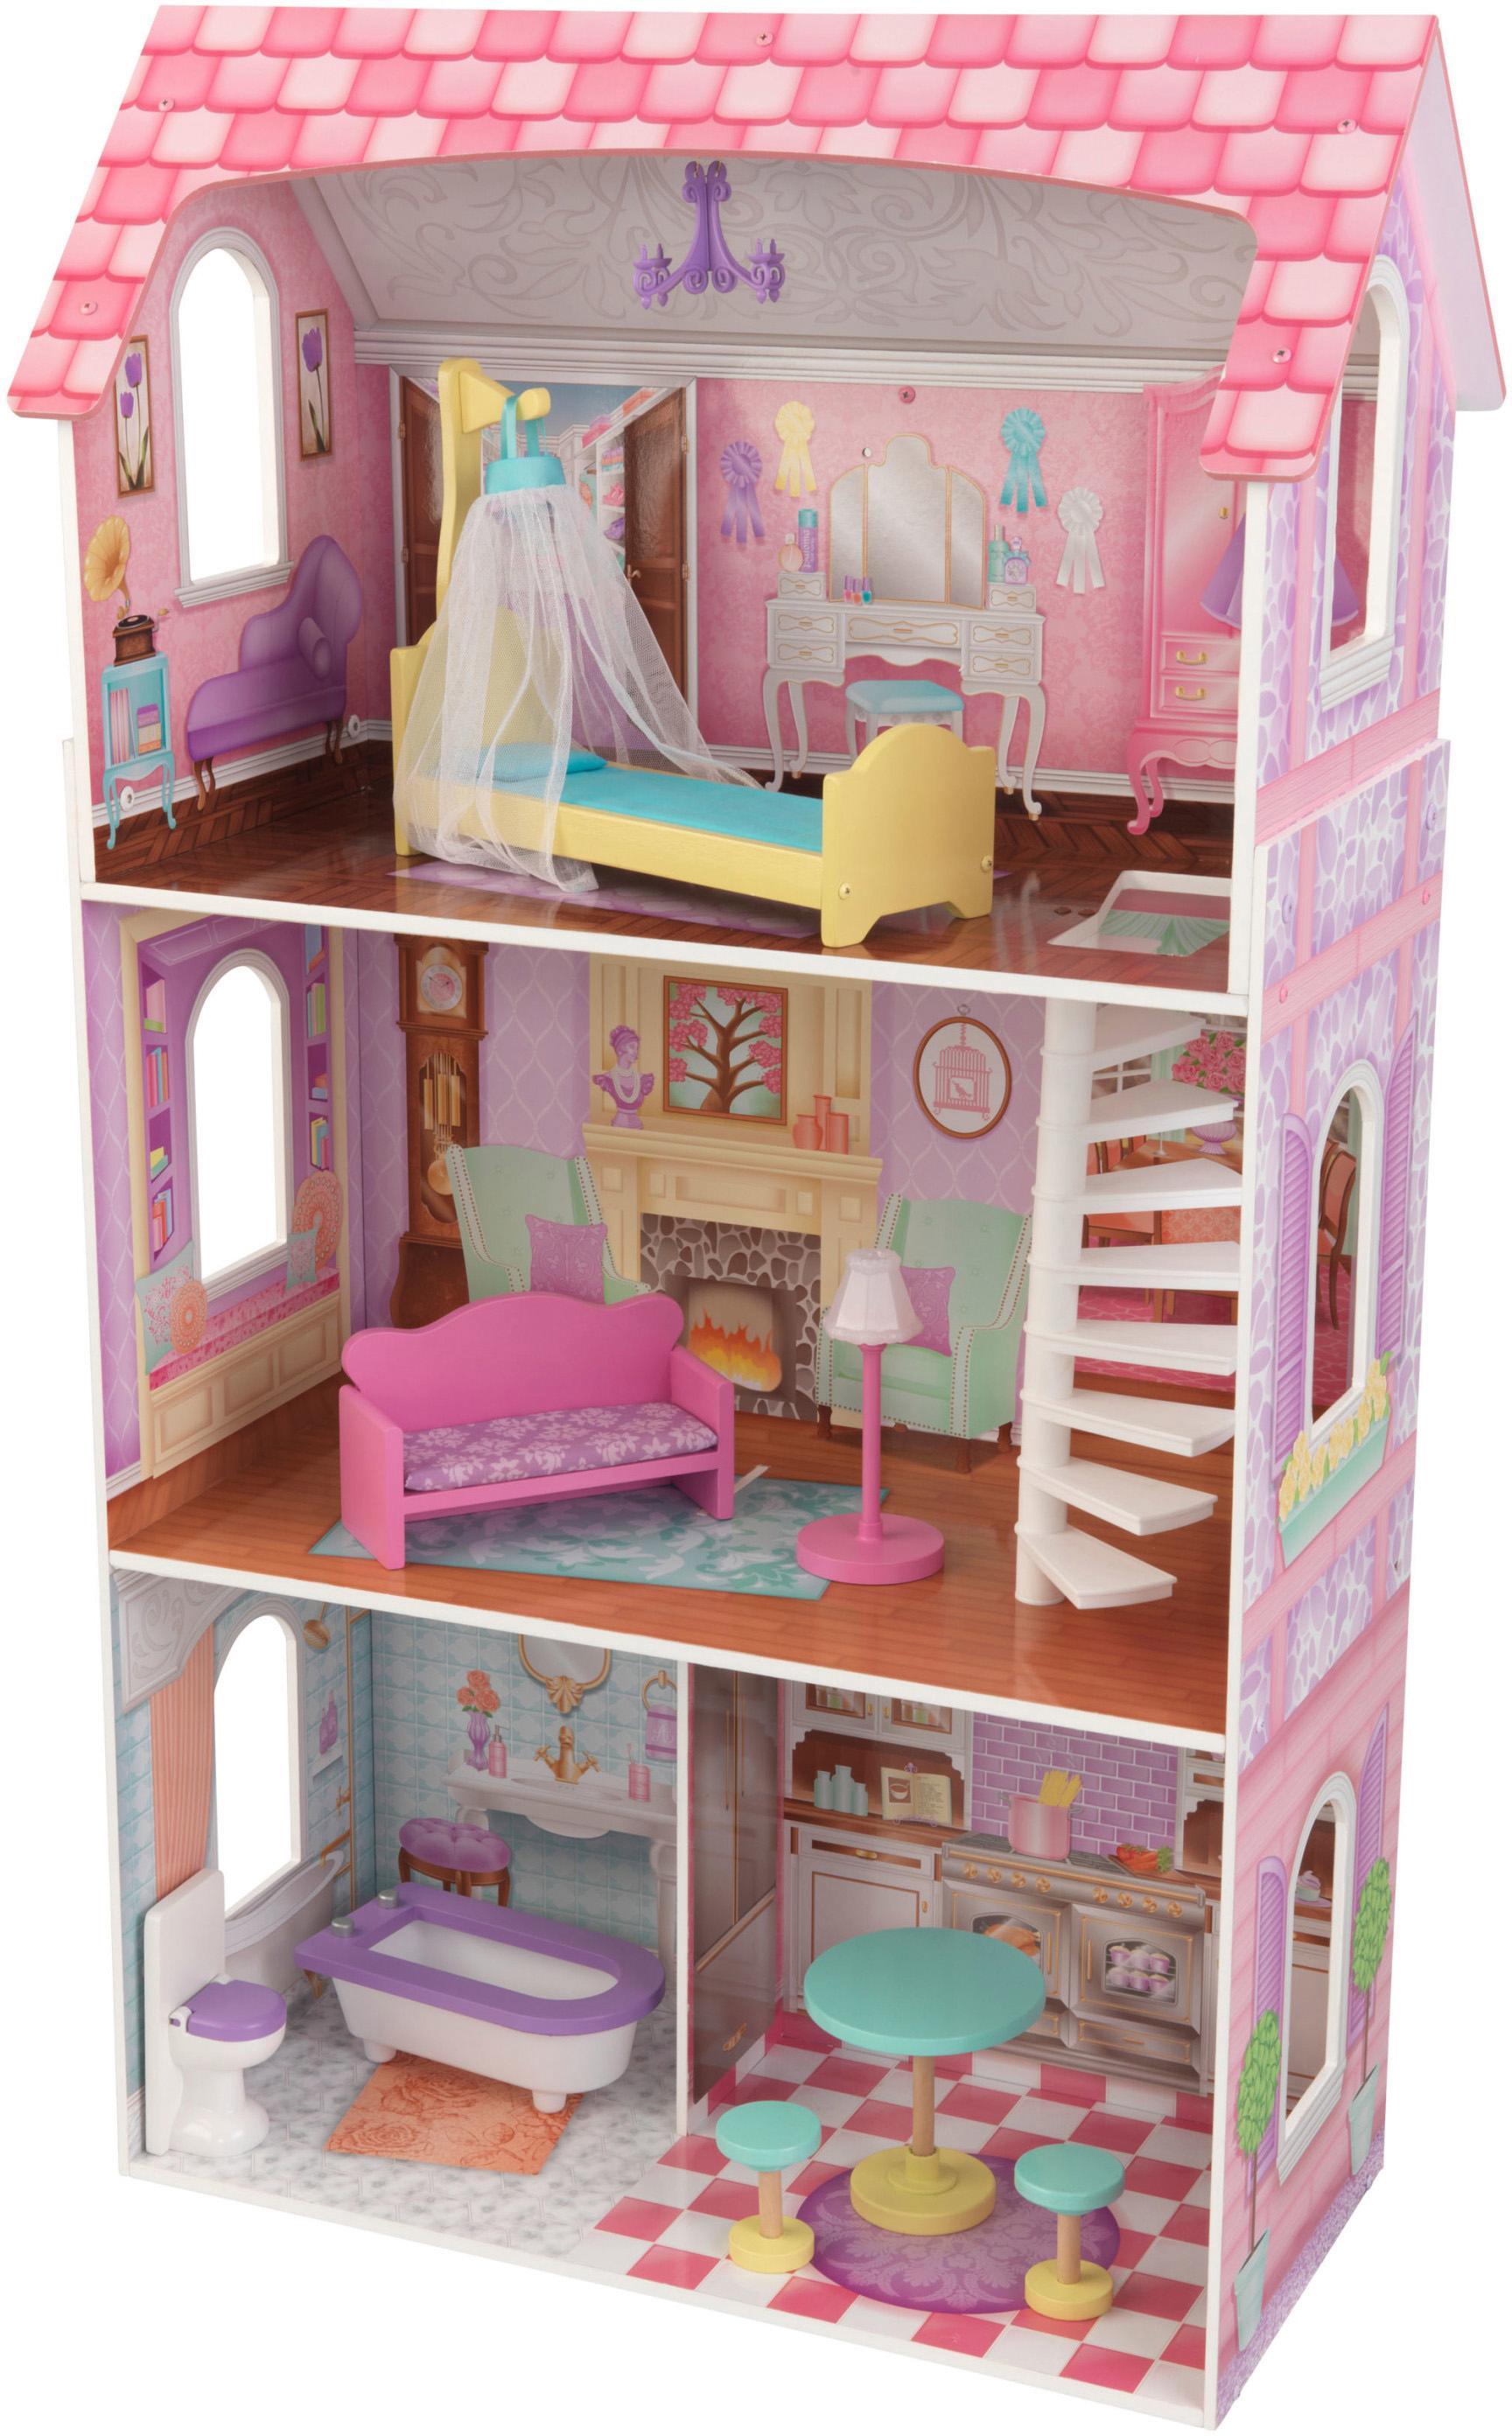 "KidKraft Puppenhaus ""Penelope"" Kindermode/Spielzeug/Puppen/Puppenhaus"